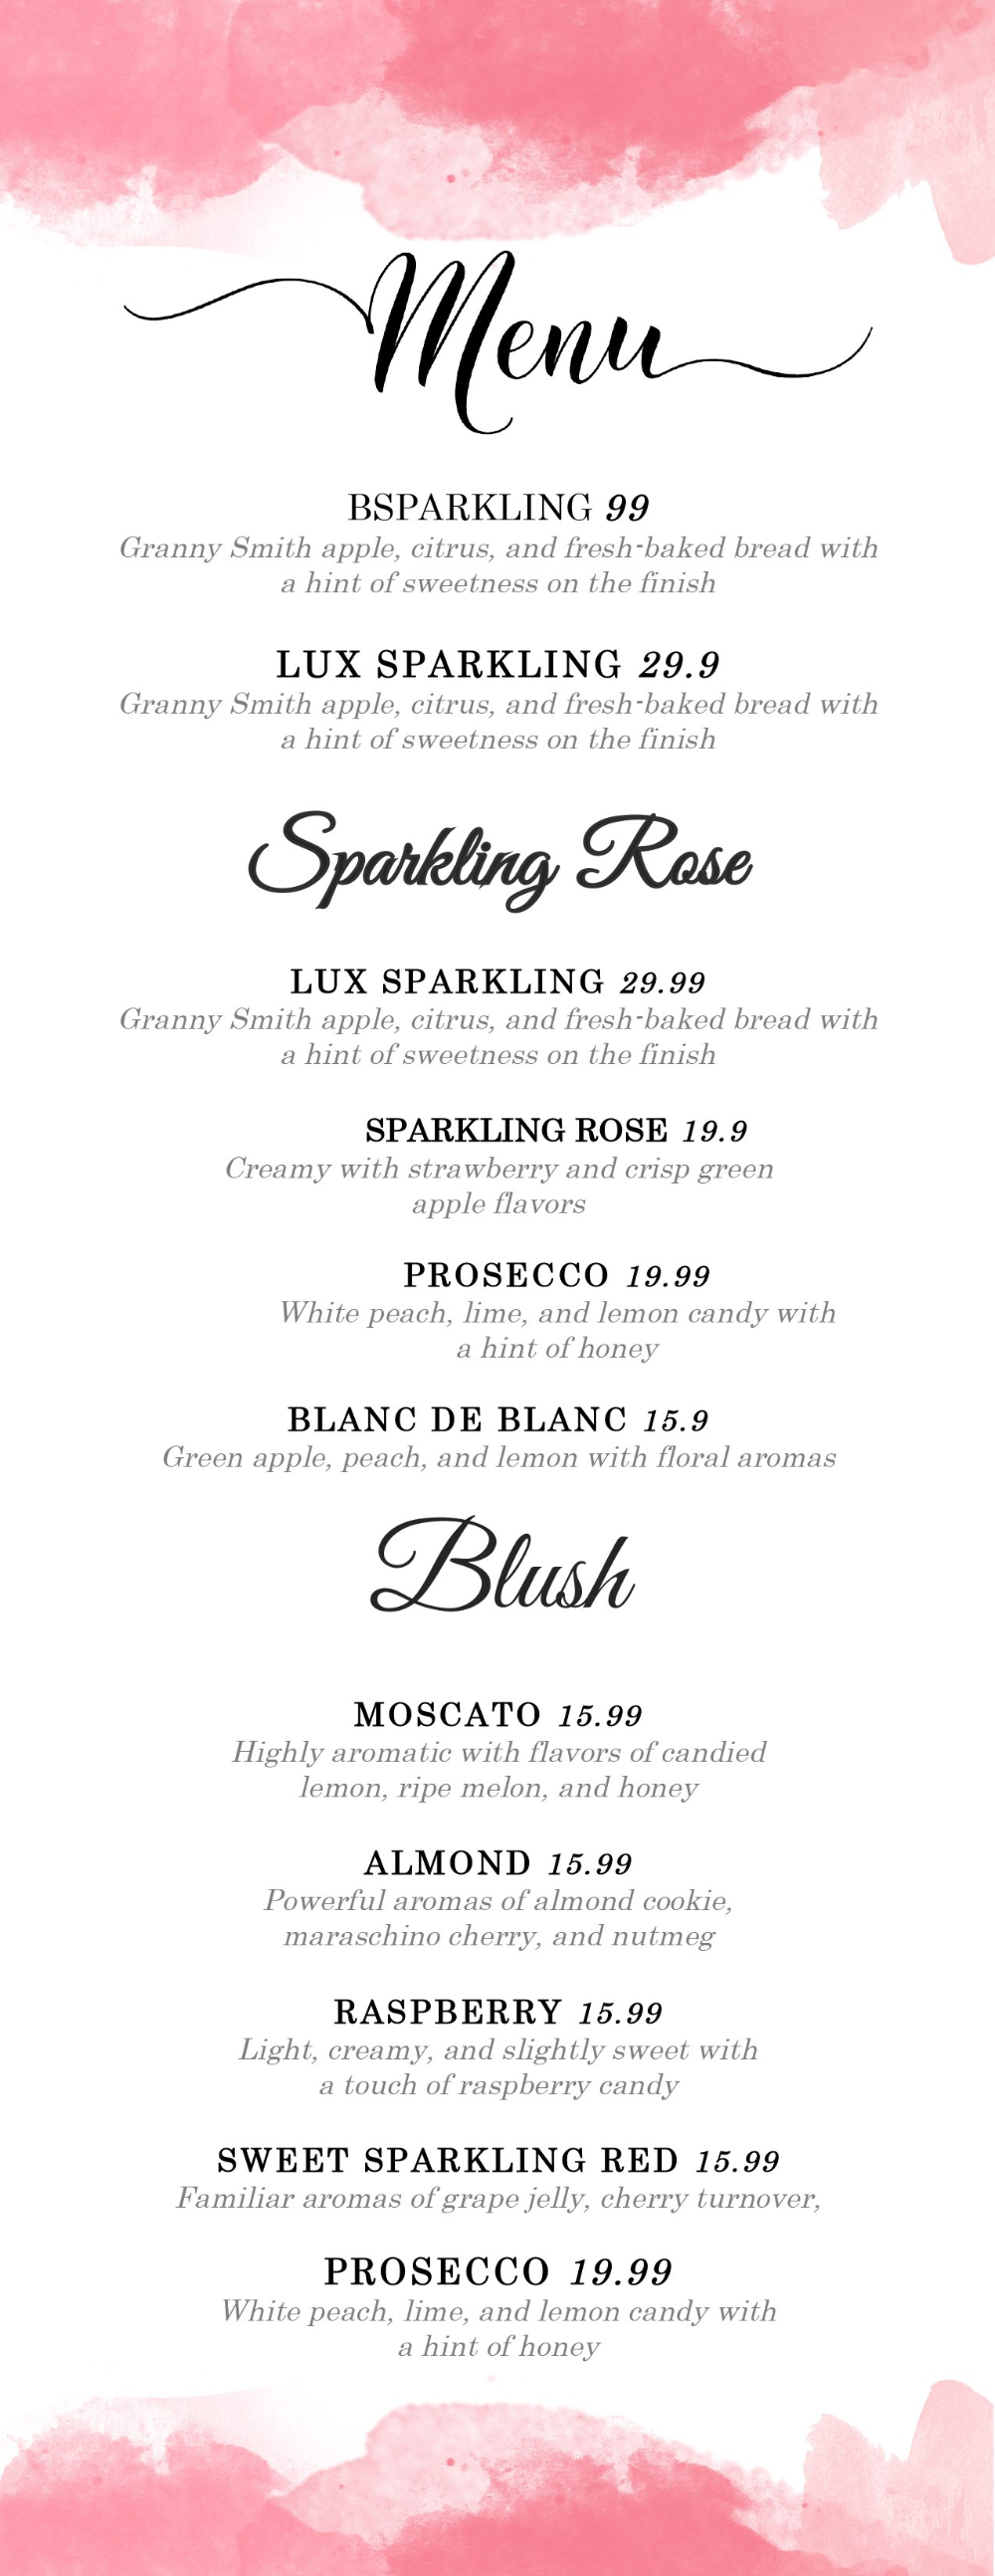 Design Templates Menu Templates Wedding Menu Food Menu Bar With Regard To Wedding Menu Templates Free Download - 10+ Professional Templates Ideas | 10+ Professional Templates Ideas #weddingmenutemplate